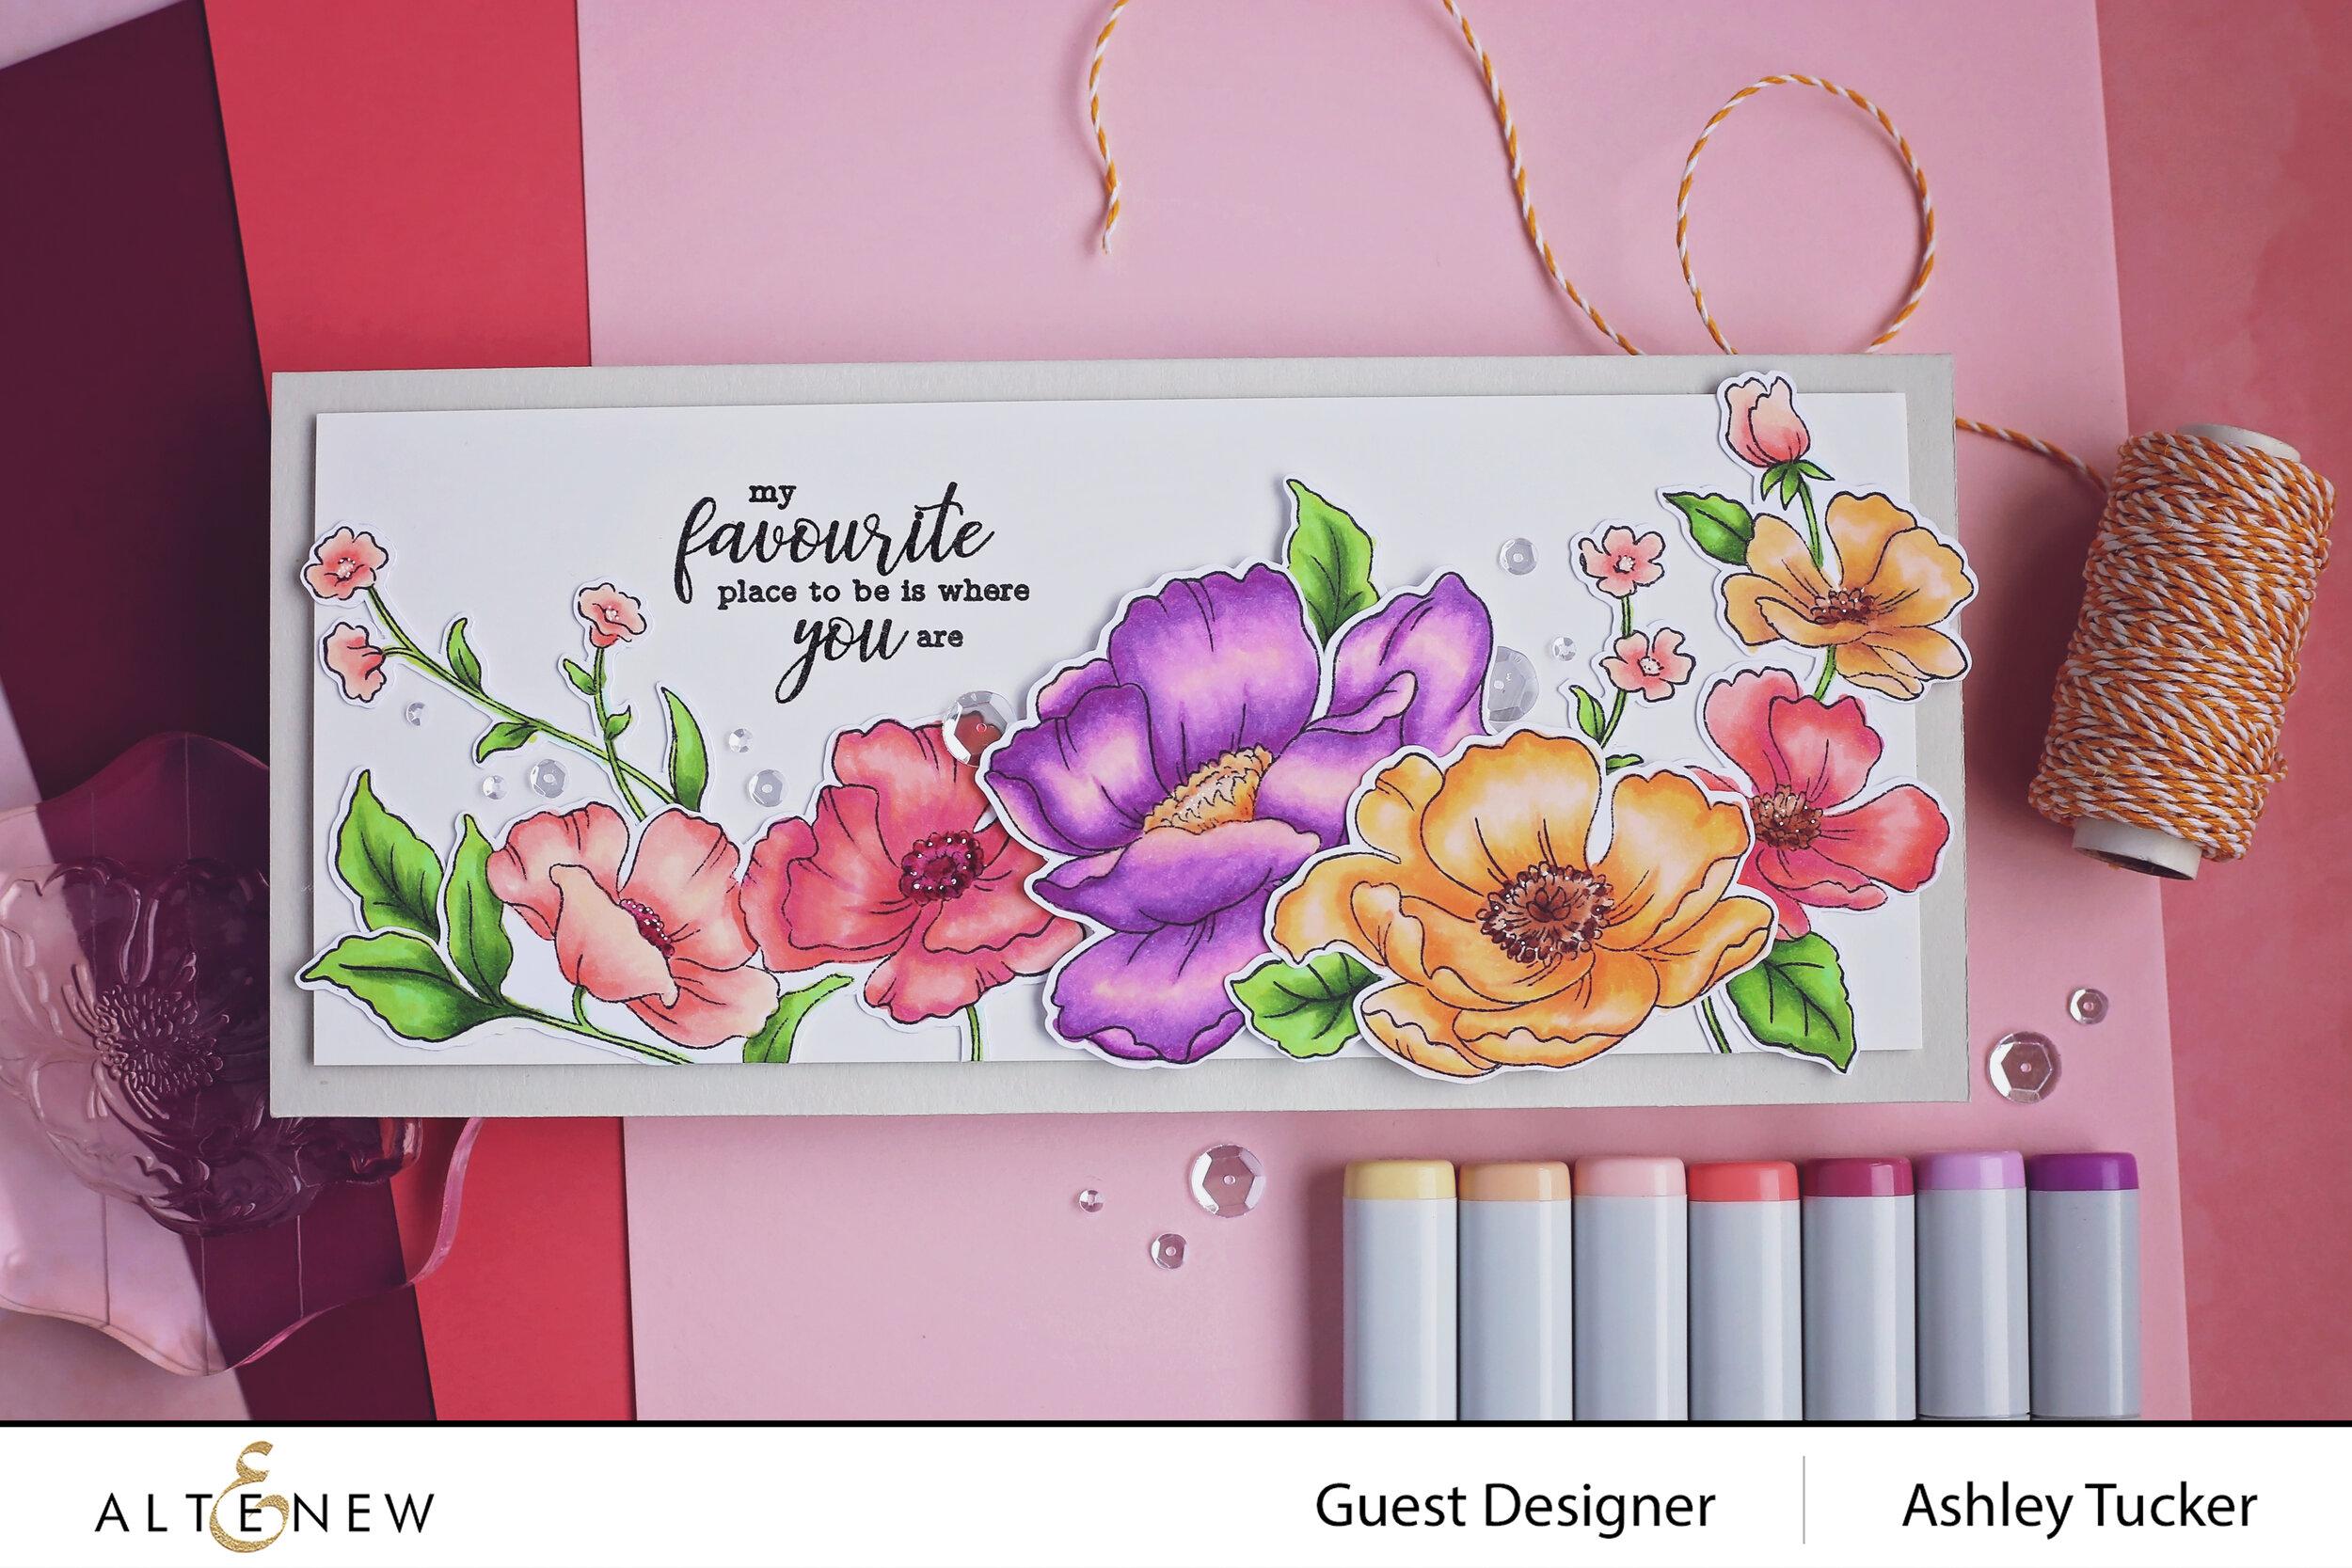 Altenew - Poppy Garden Stamp Set and Across the Pond Stamp Set - Ashley Tucker - 1.jpg